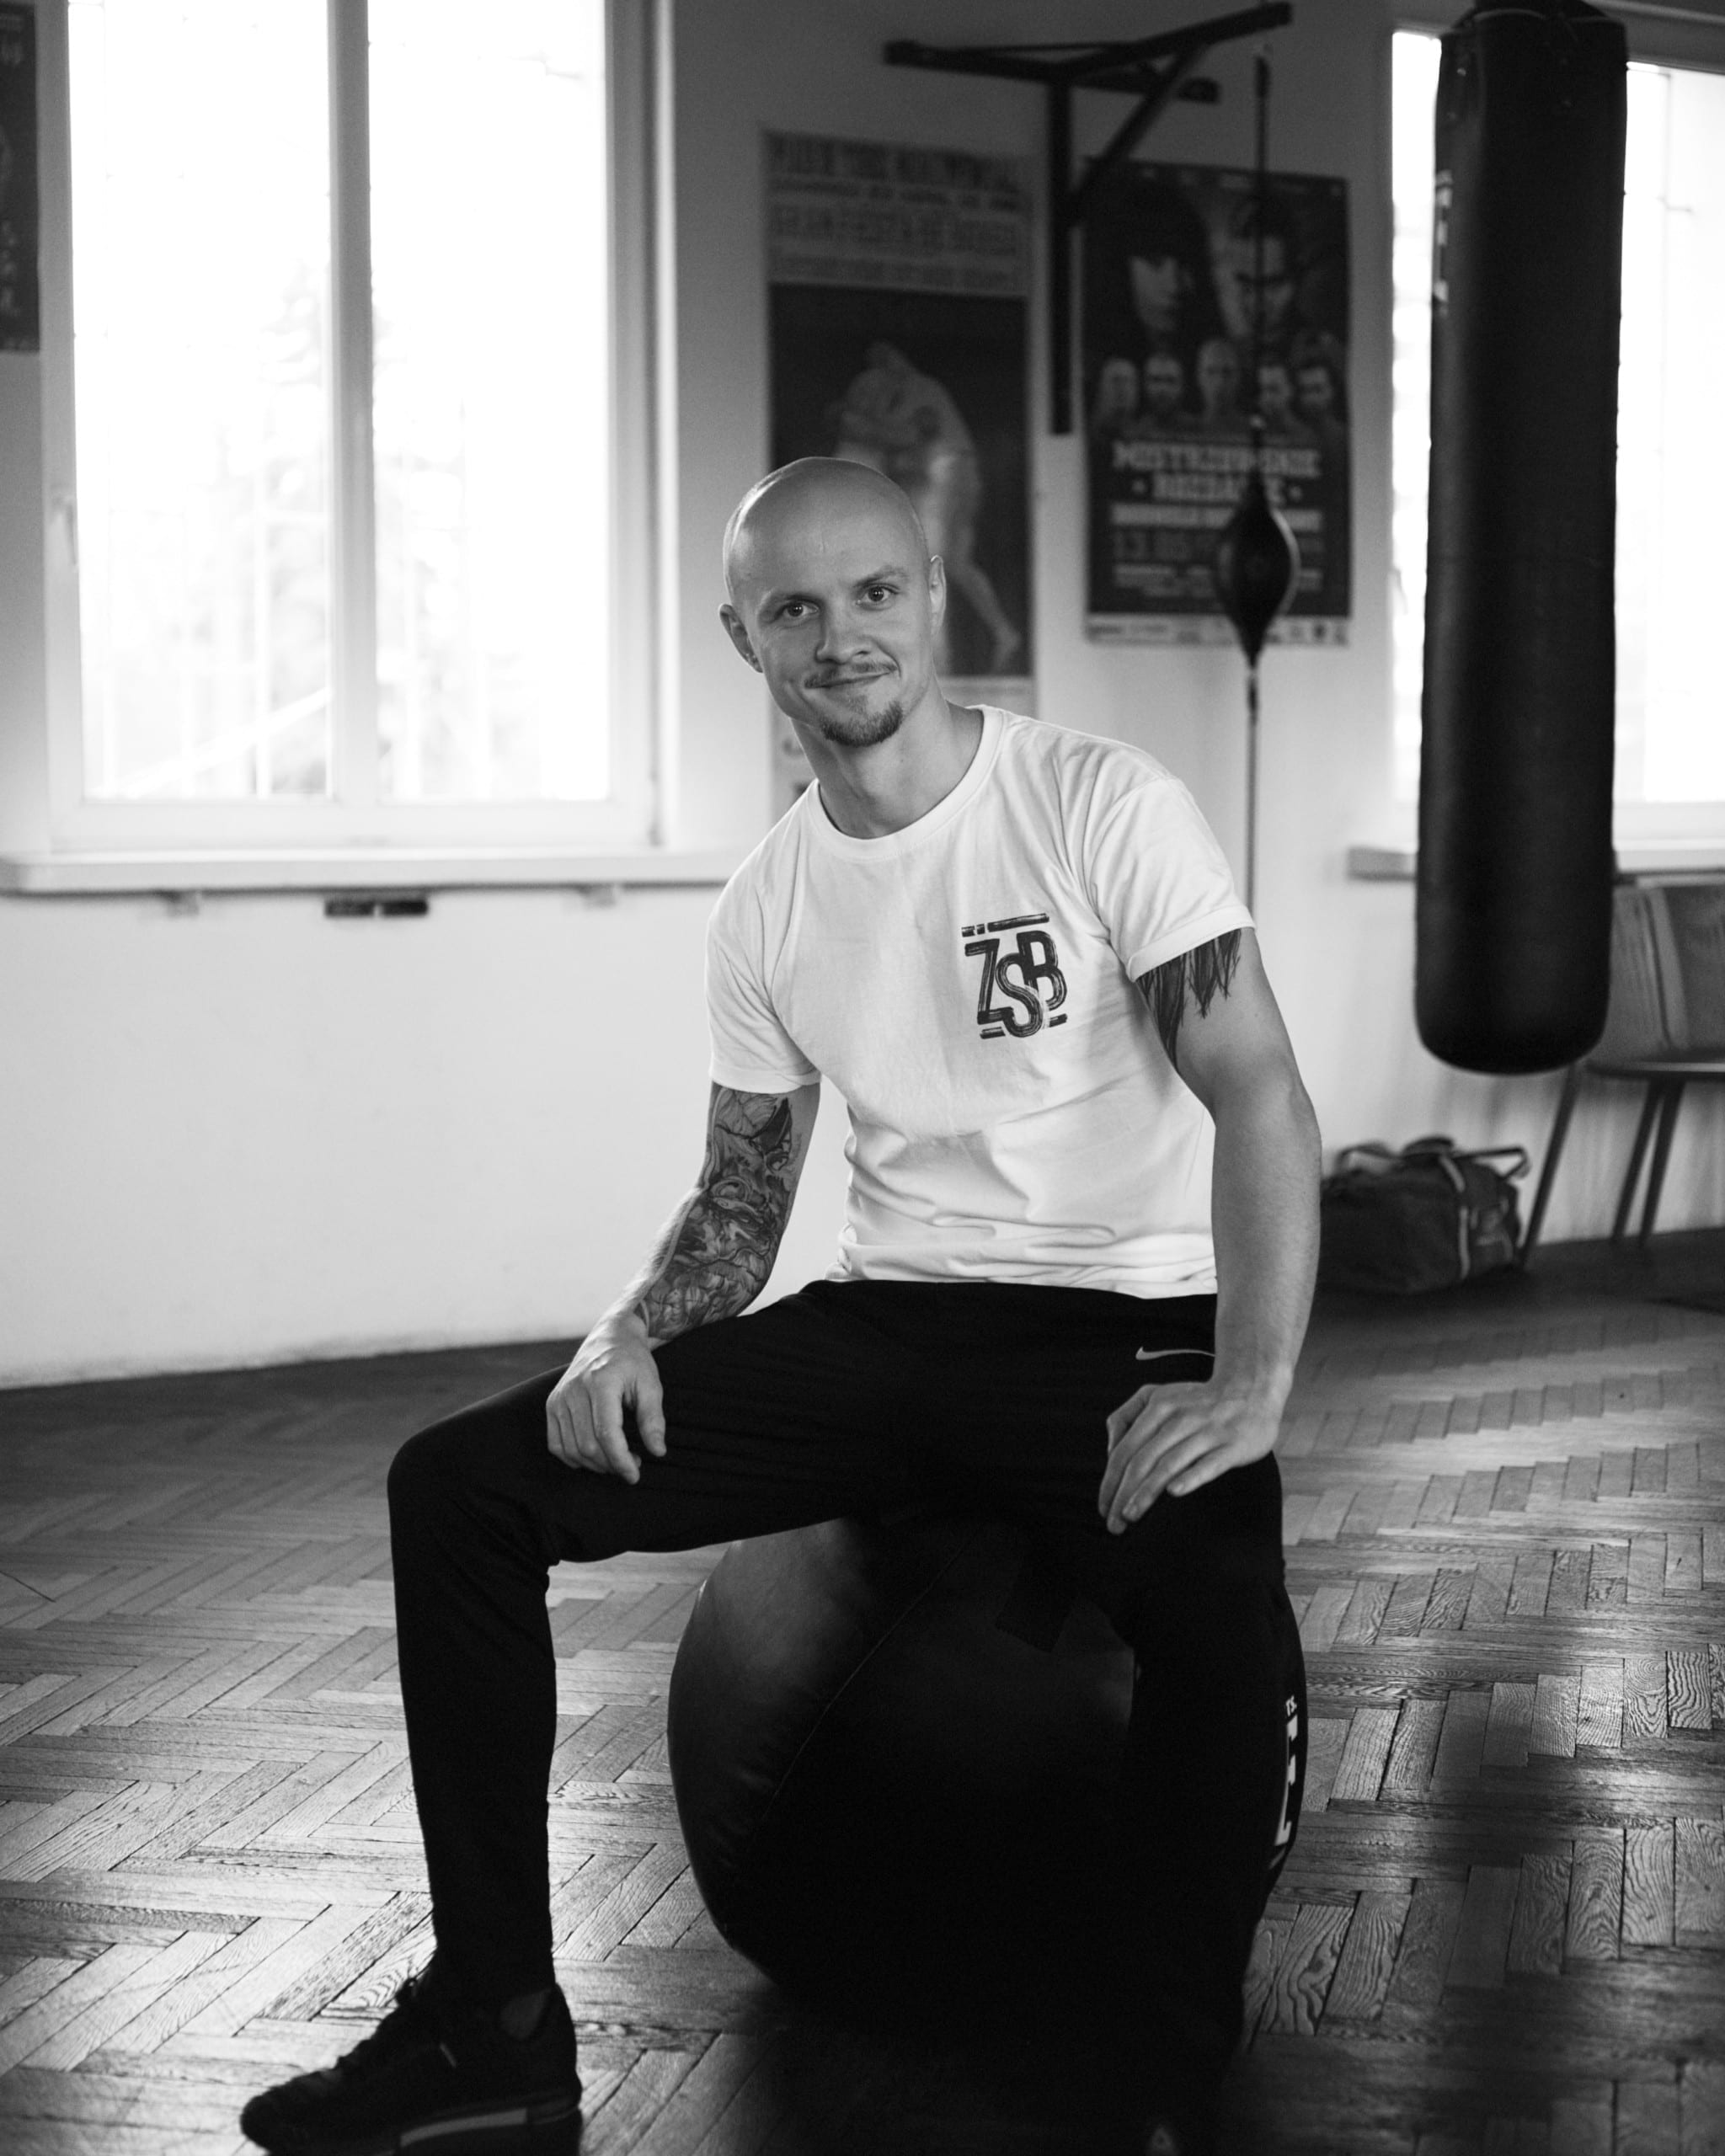 Piotr Osiecki